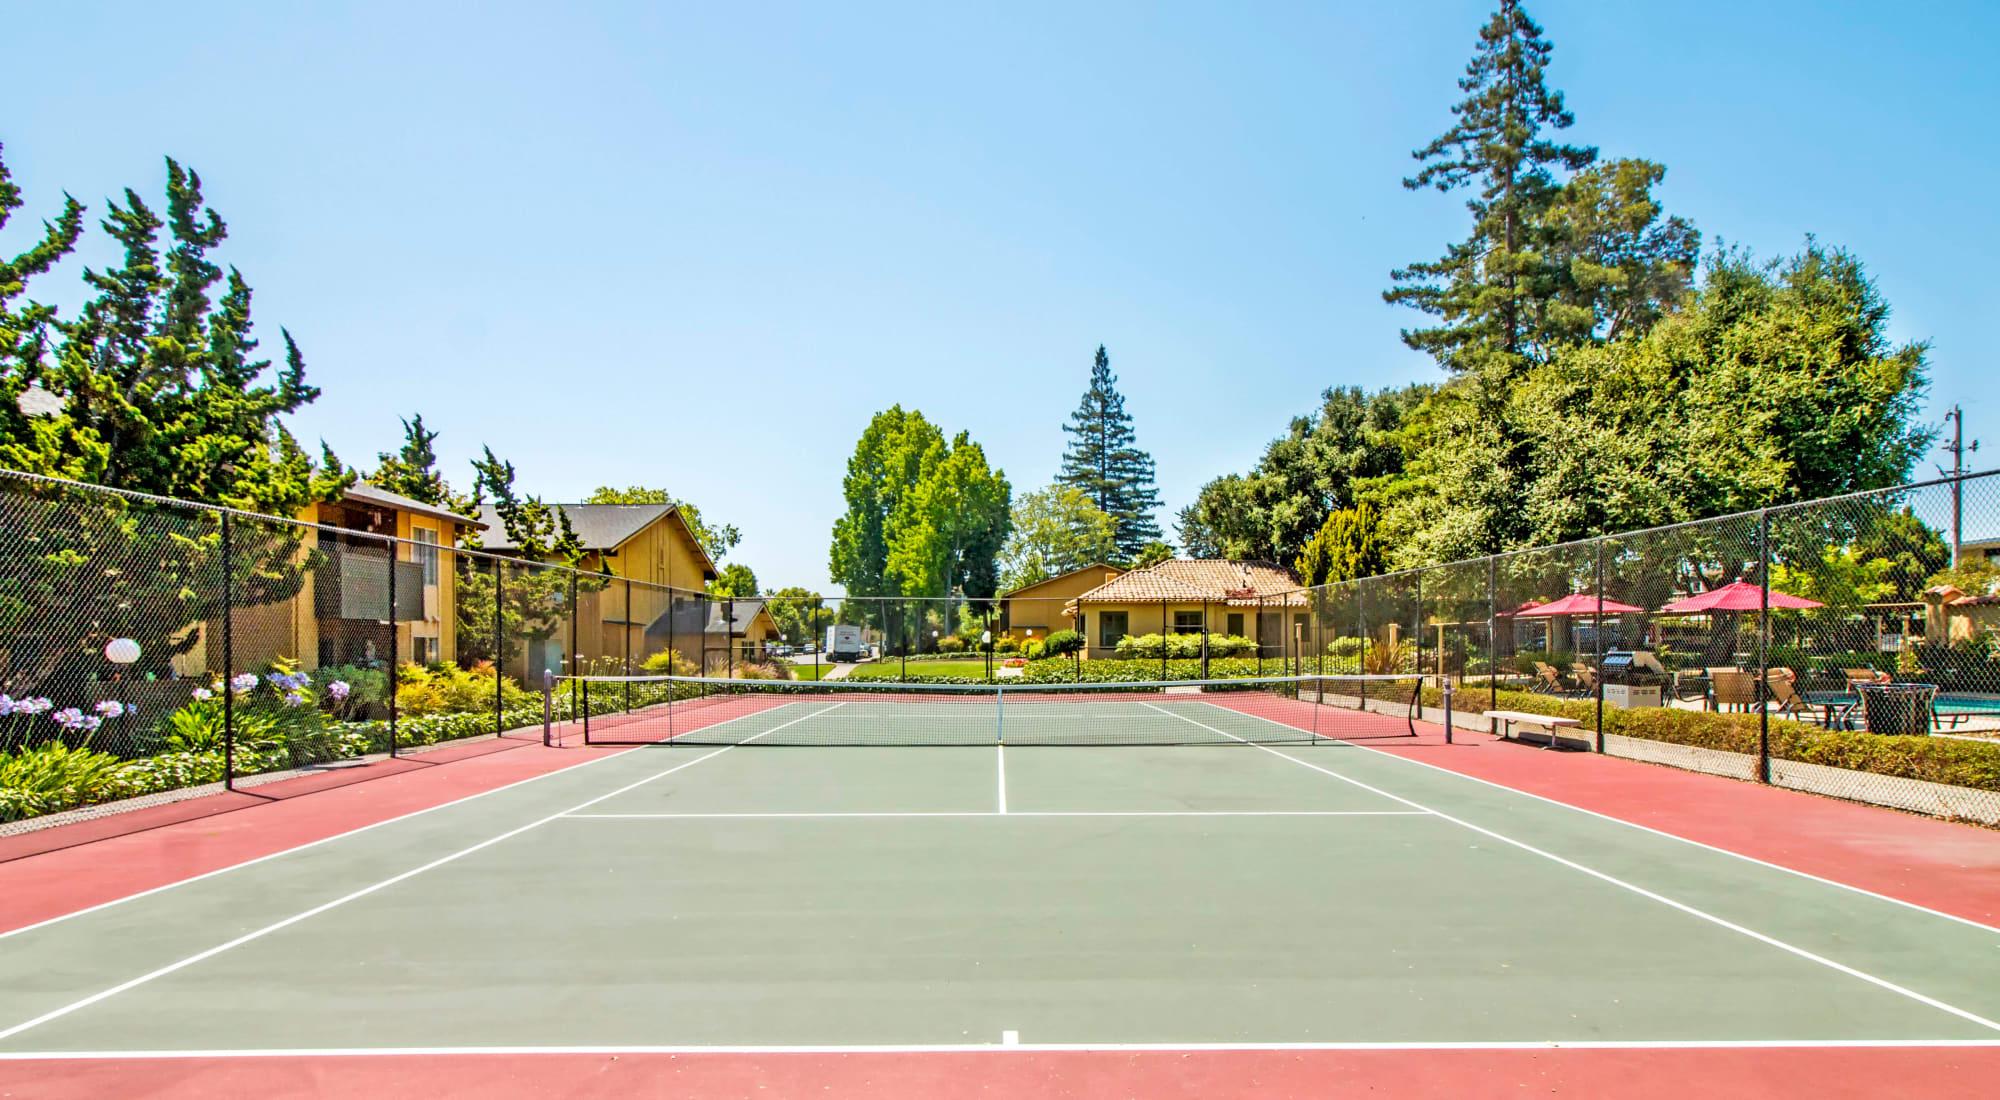 Neighborhood at The Landmark Apartment Homes in Sunnyvale, California